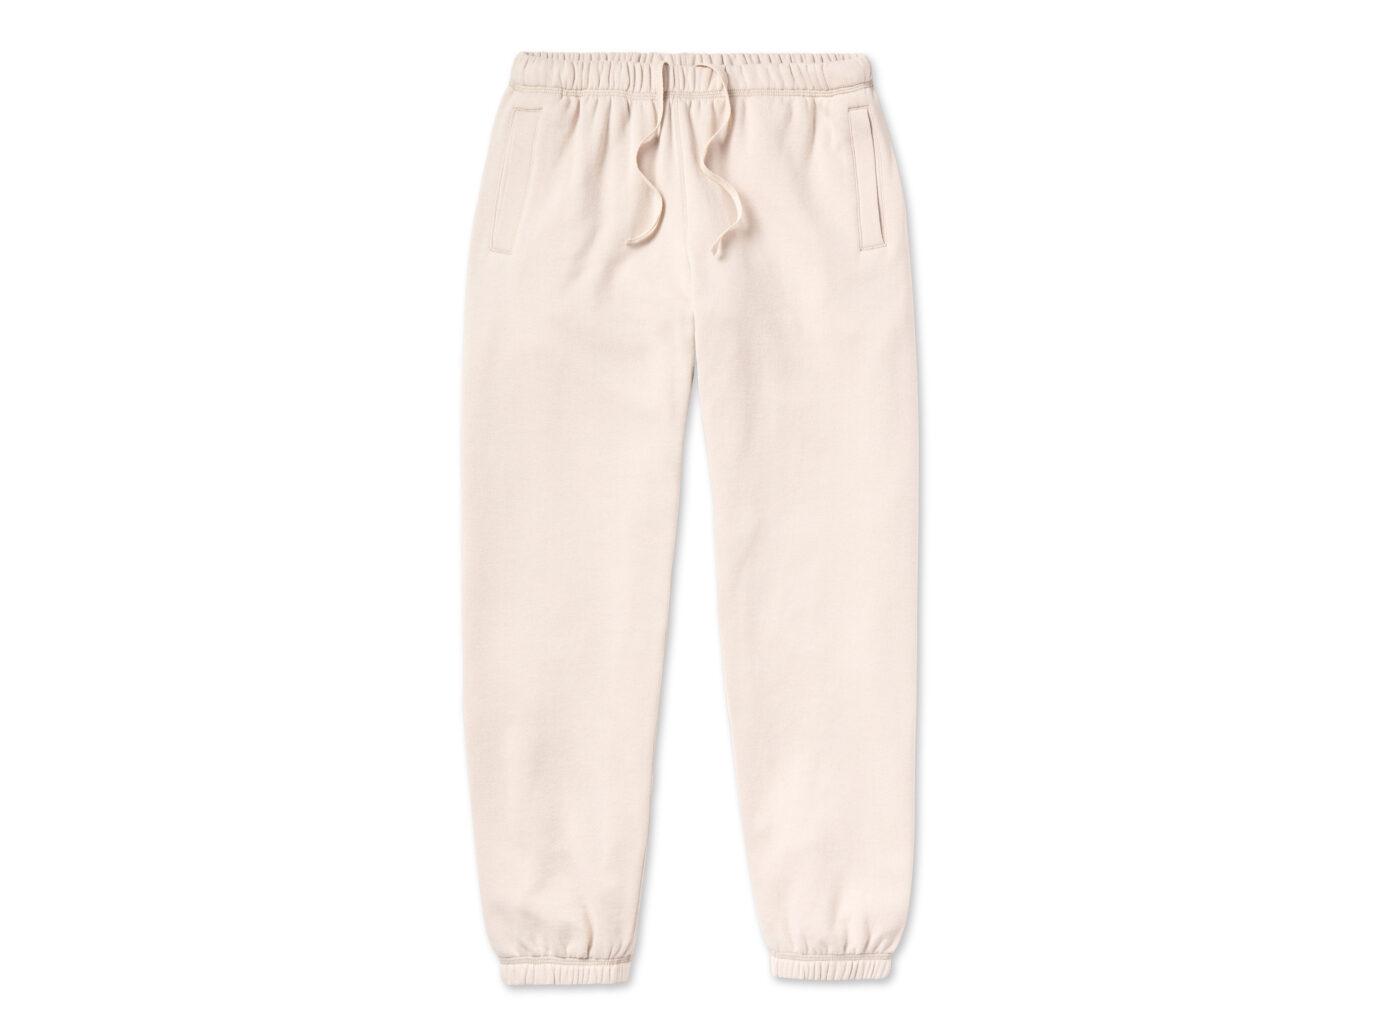 Entireworld Loop Back Sweatpants Cream Sweatpants